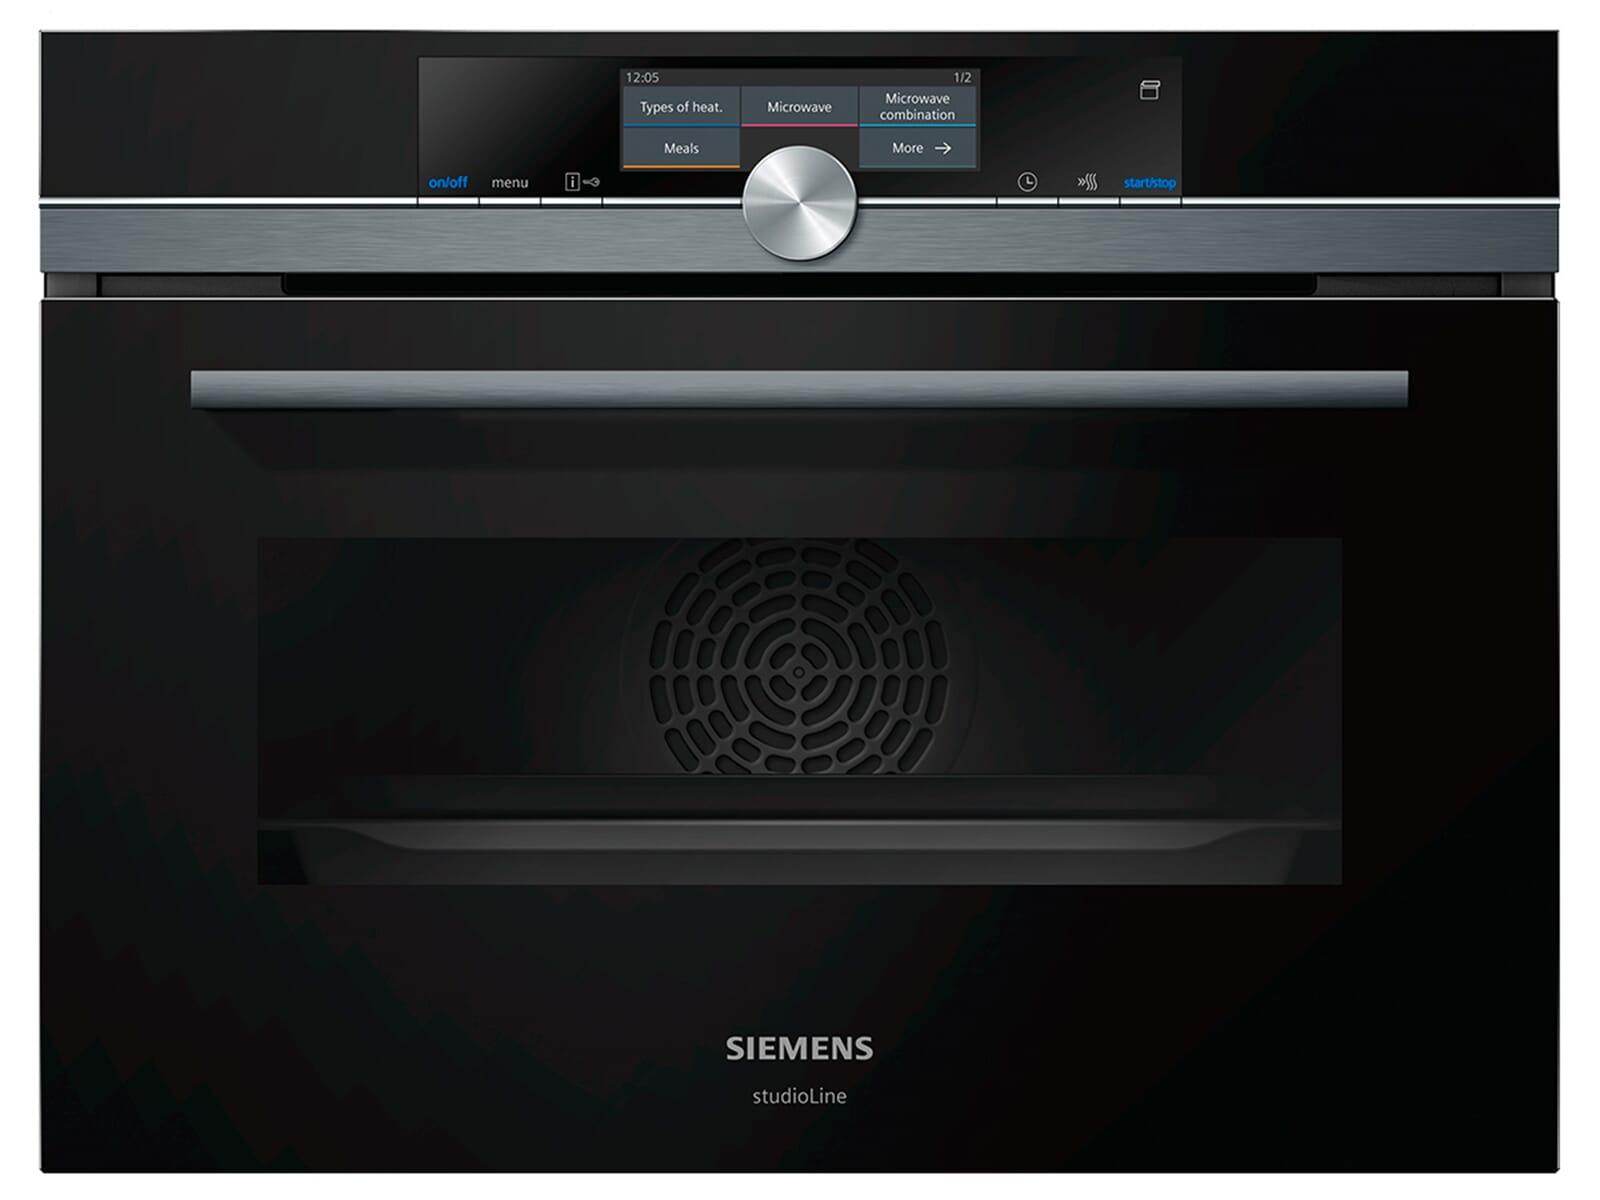 Siemens studioLine CN878G4B6 Pyrolyse Kompaktbackofen mit Mikrowelle und Dampf blackSteel